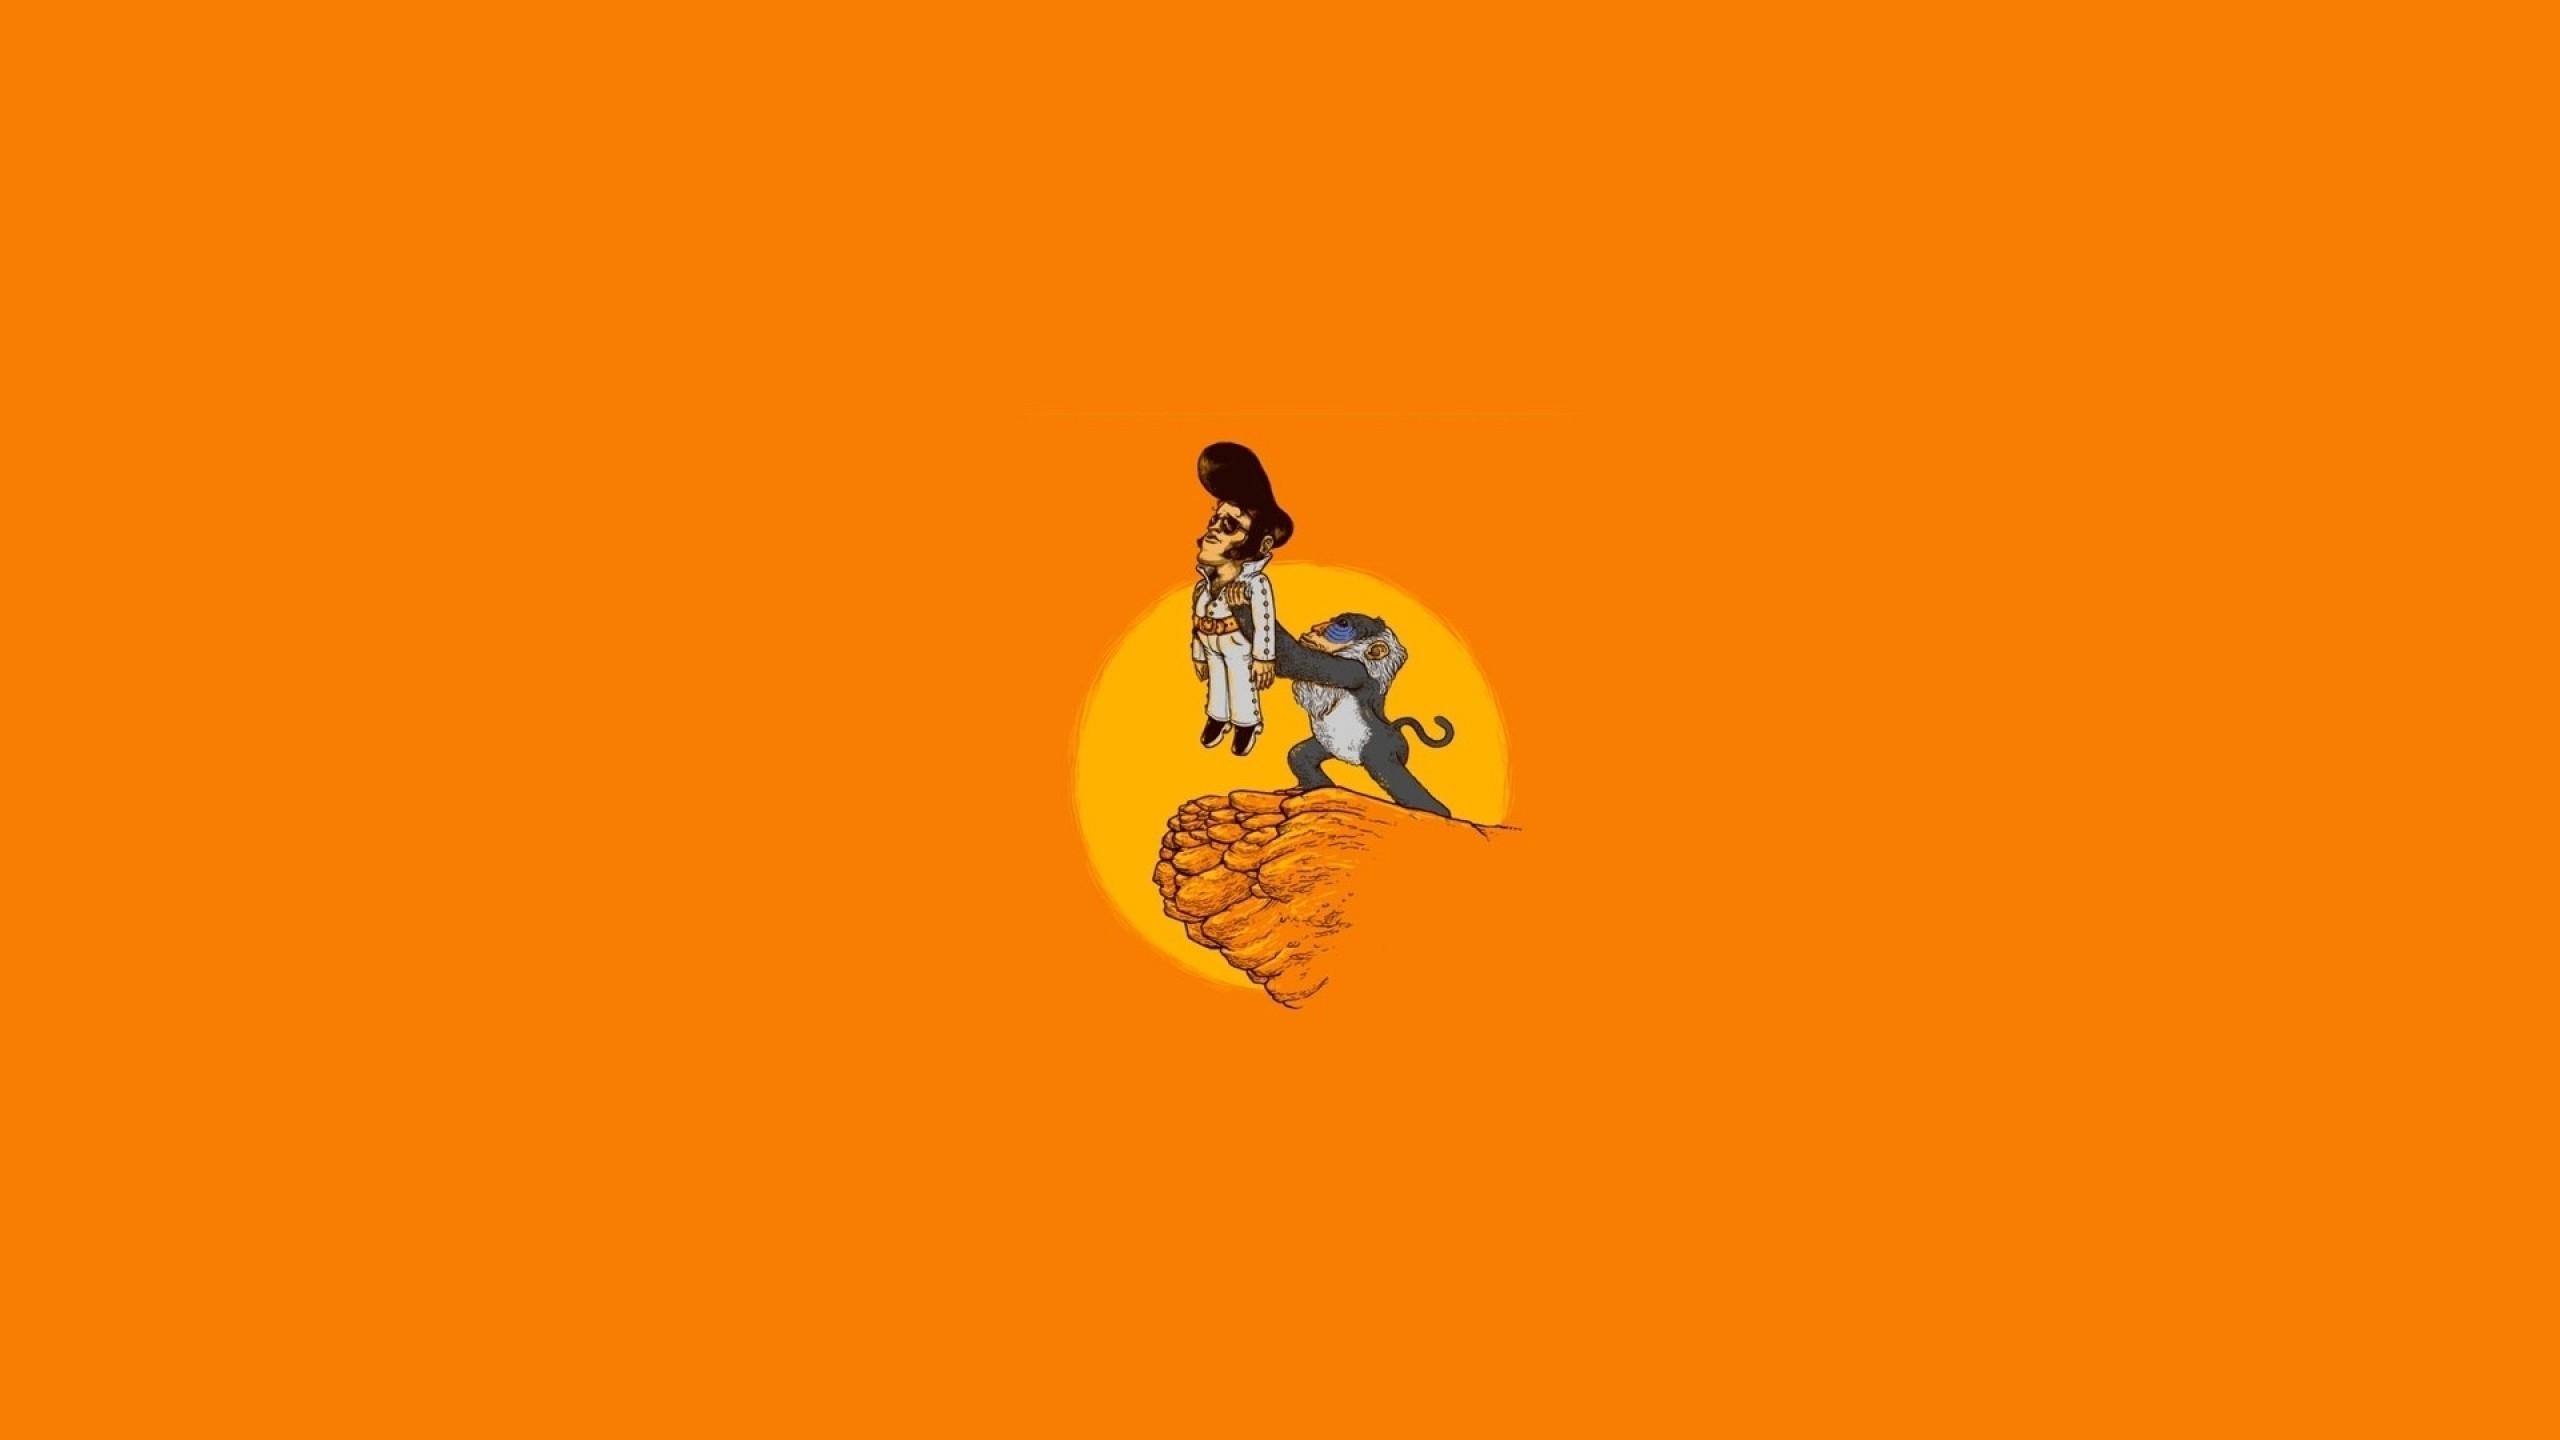 Solid Orange Wallpaper Download